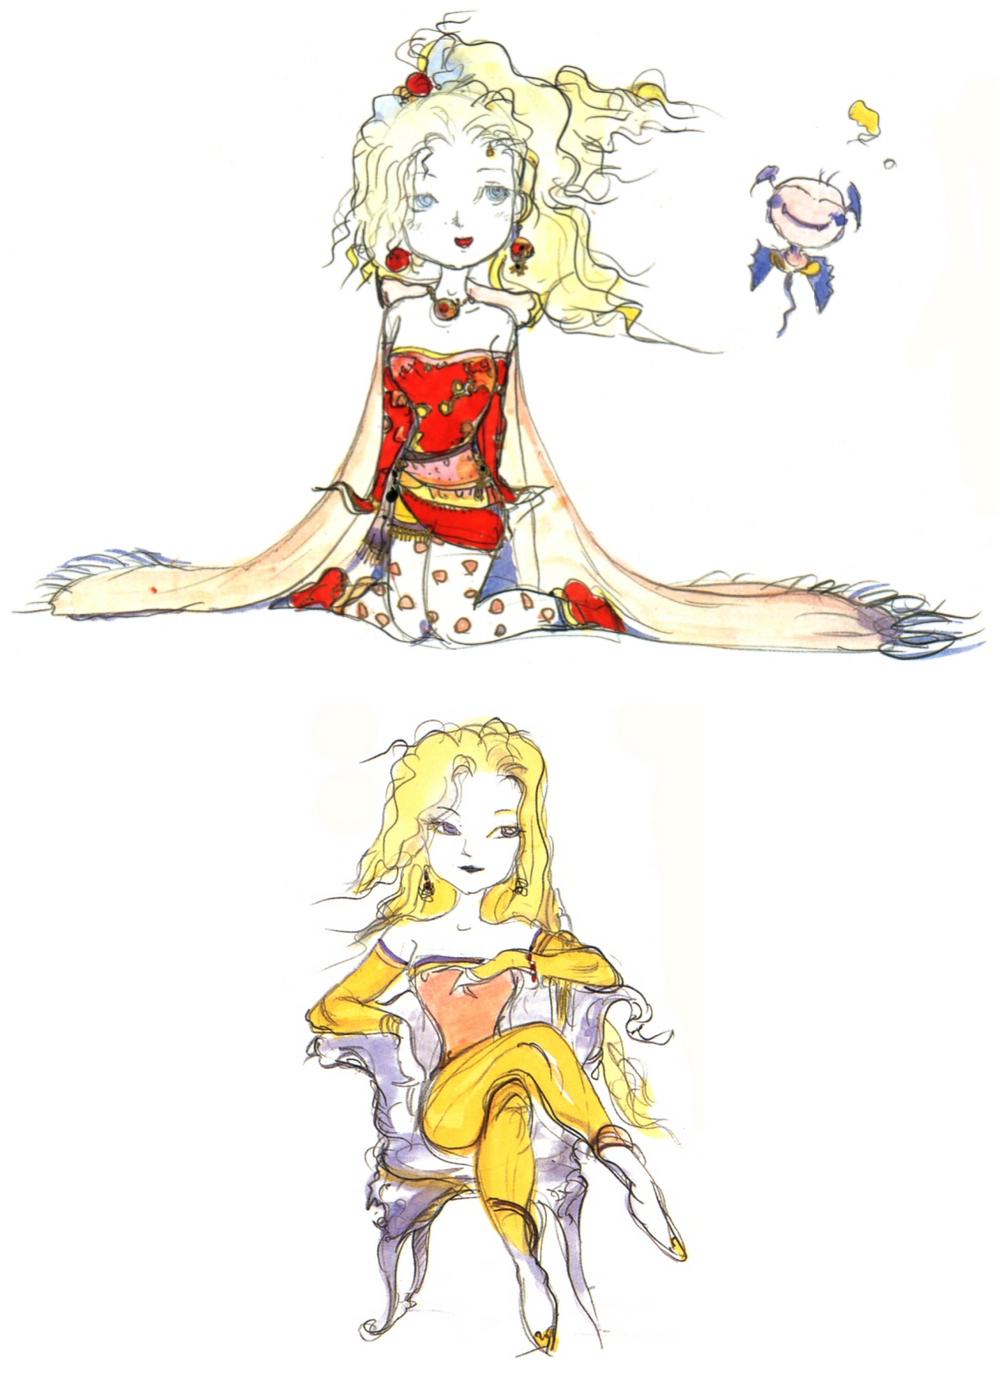 Final Fantasy VI (Video Game) - TV Tropes